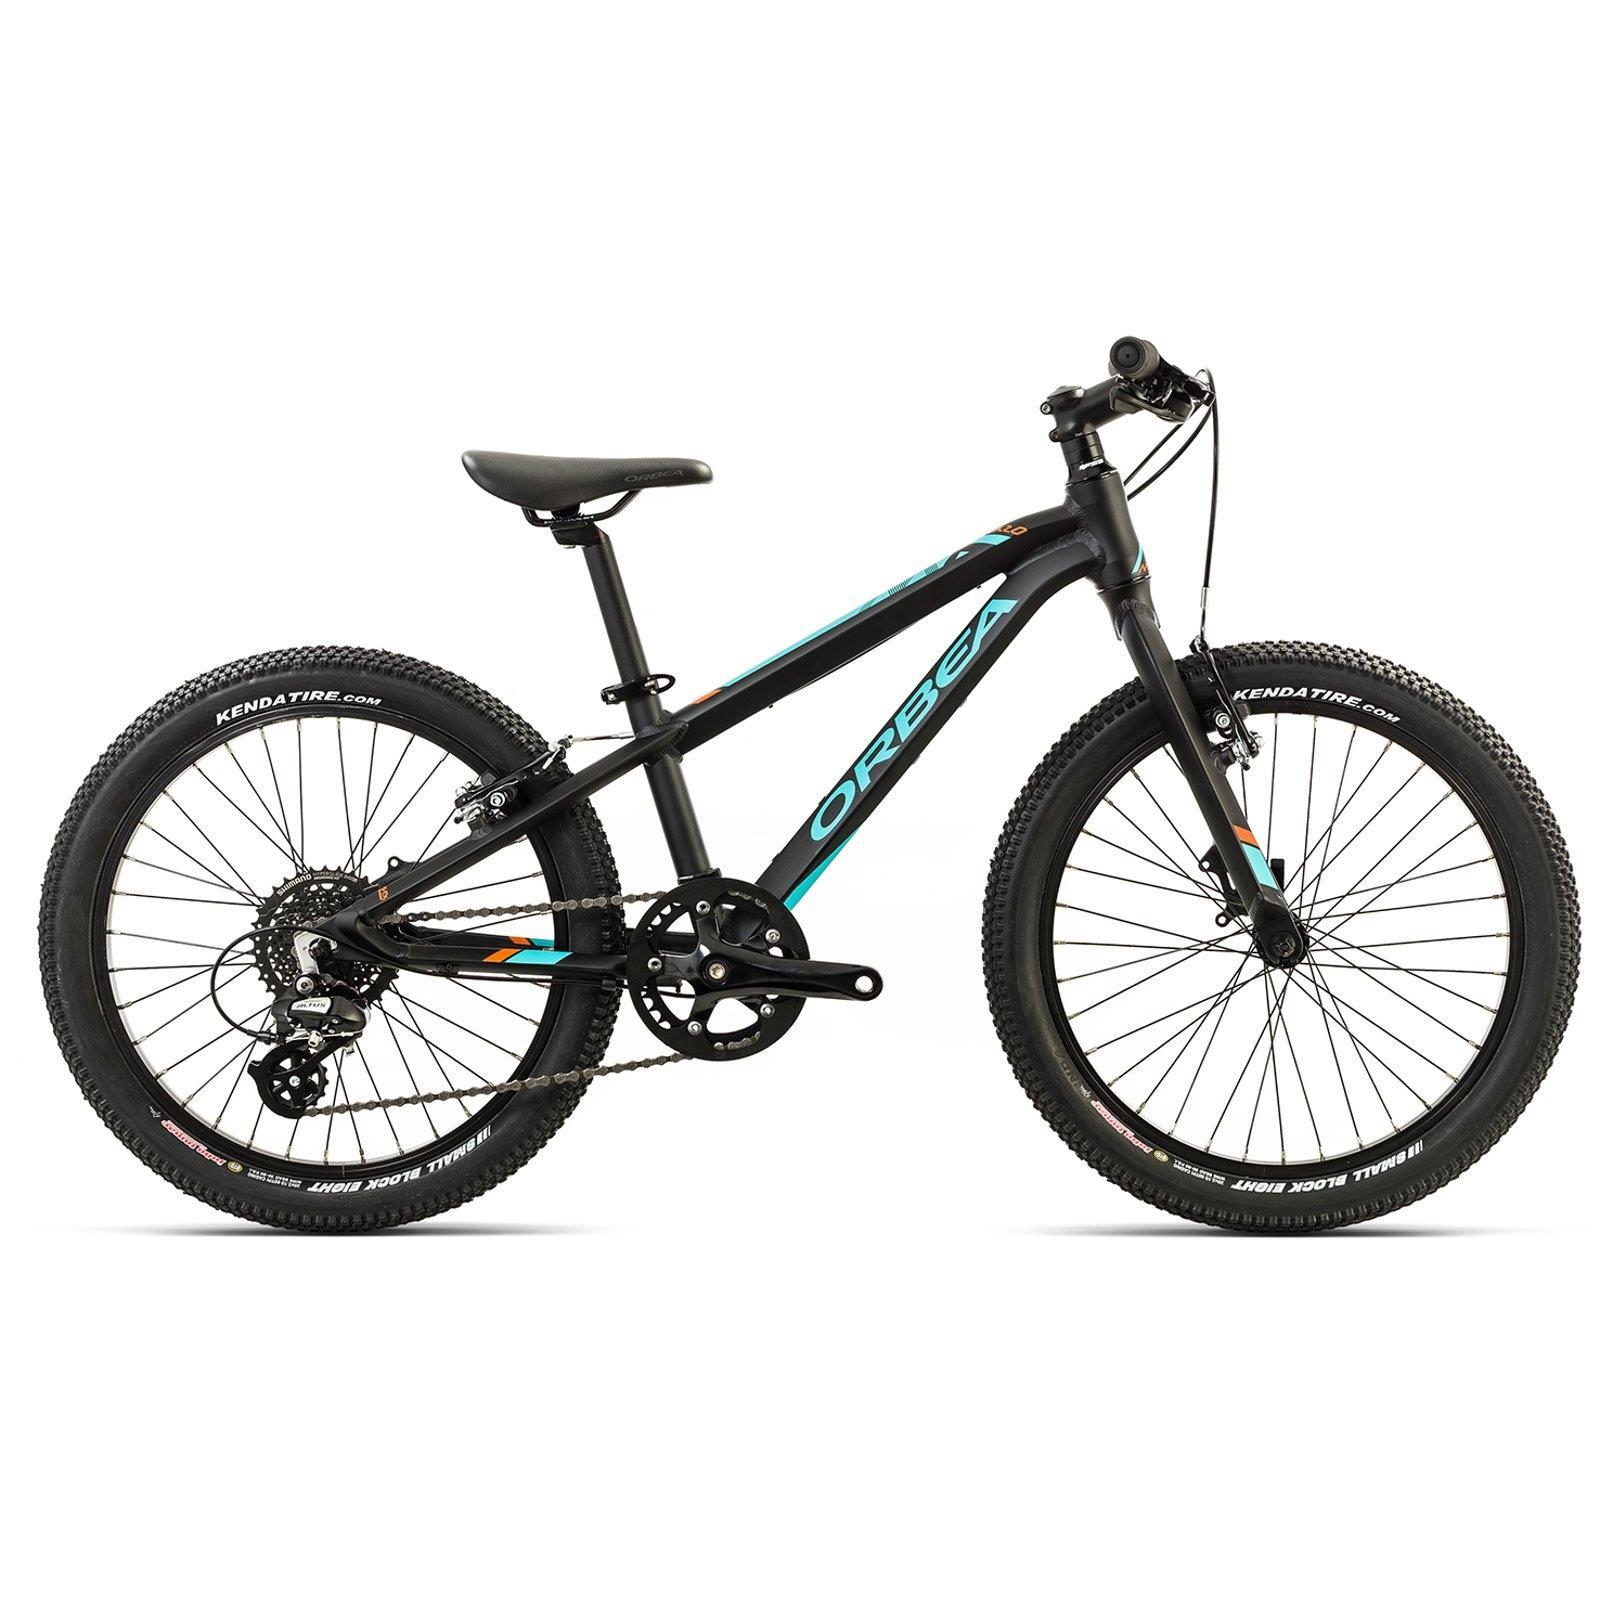 orbea mx 20 team kinder fahrrad 20 zoll 8 gang mtb rad aluminium mountain bike ebay. Black Bedroom Furniture Sets. Home Design Ideas